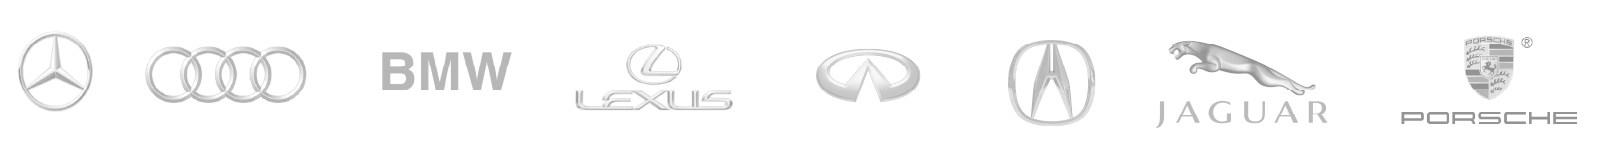 car-brand-logos-gray@2x